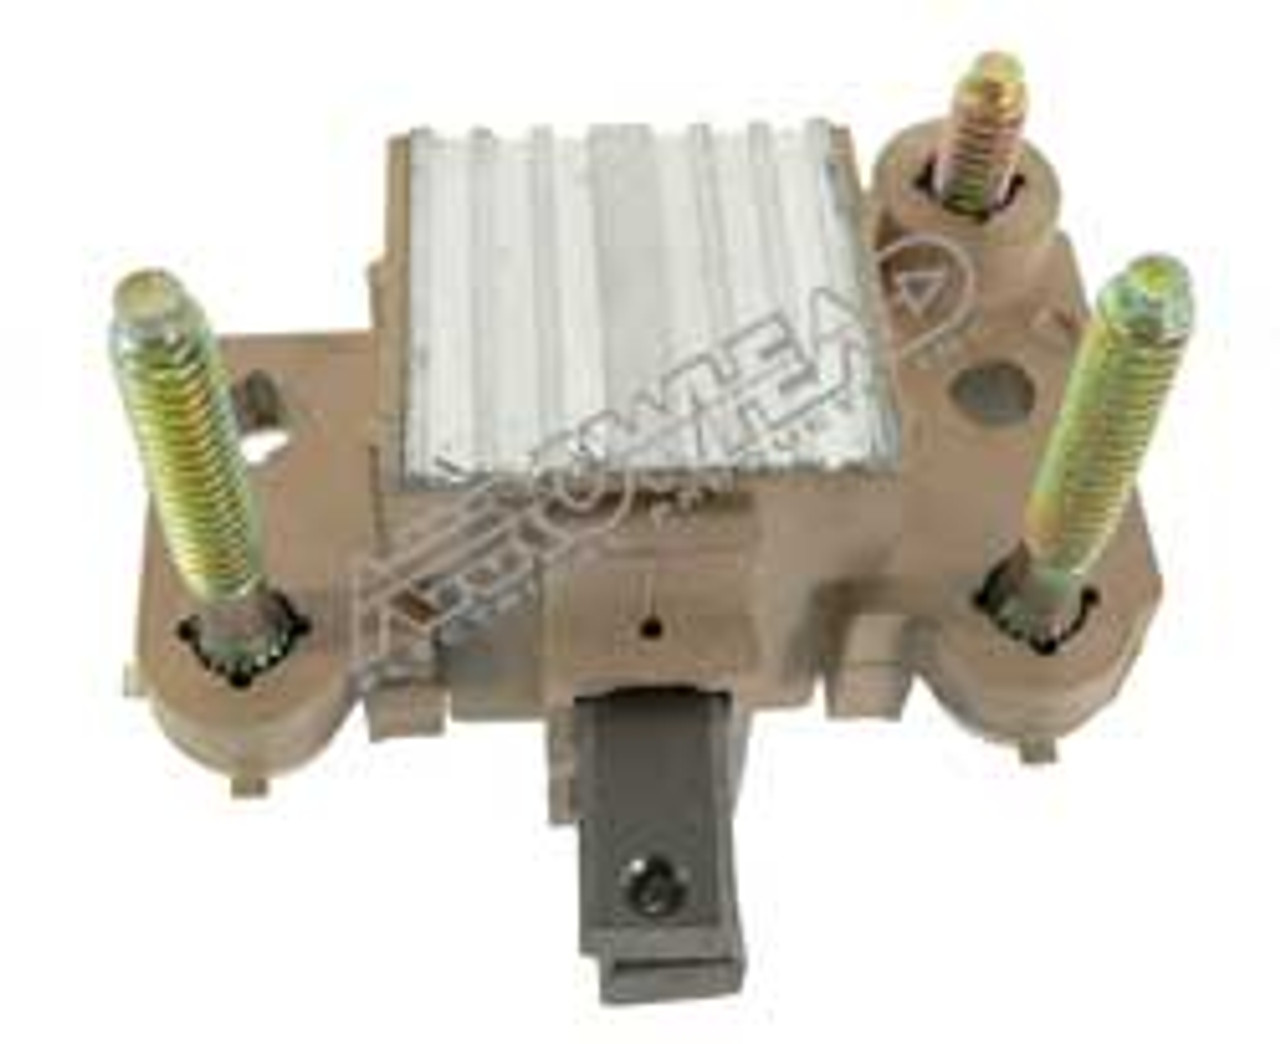 Voltage Regulator, Internal 12-Volt, A-Circuit, for Mando Alternators AMN6002